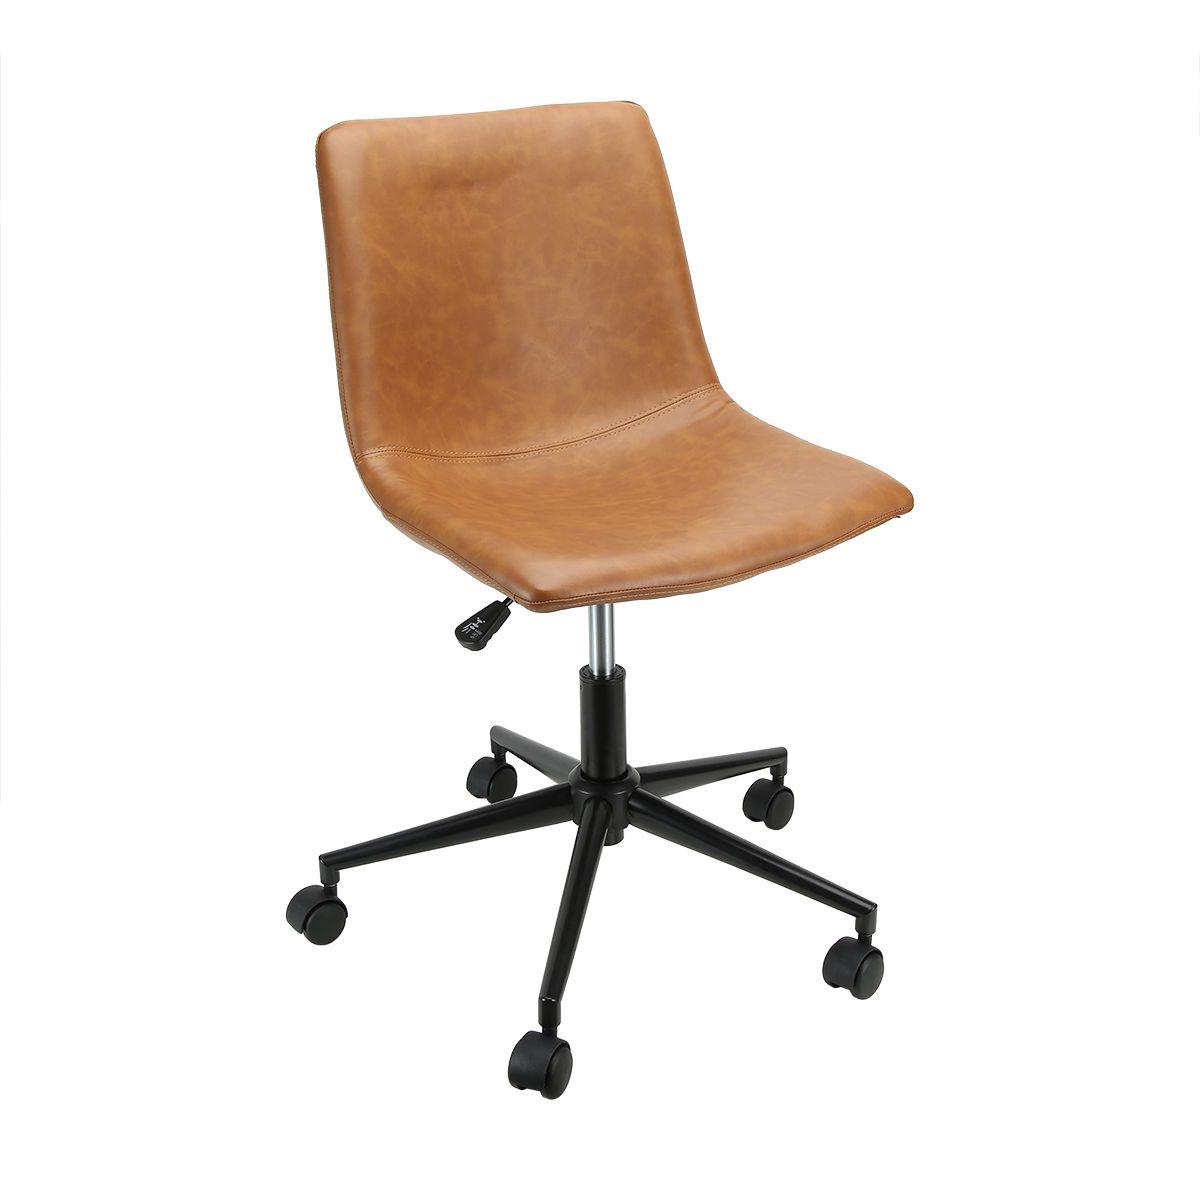 Tan Desk Chair Kmart Boy Desk Chair Chair Desk Chair